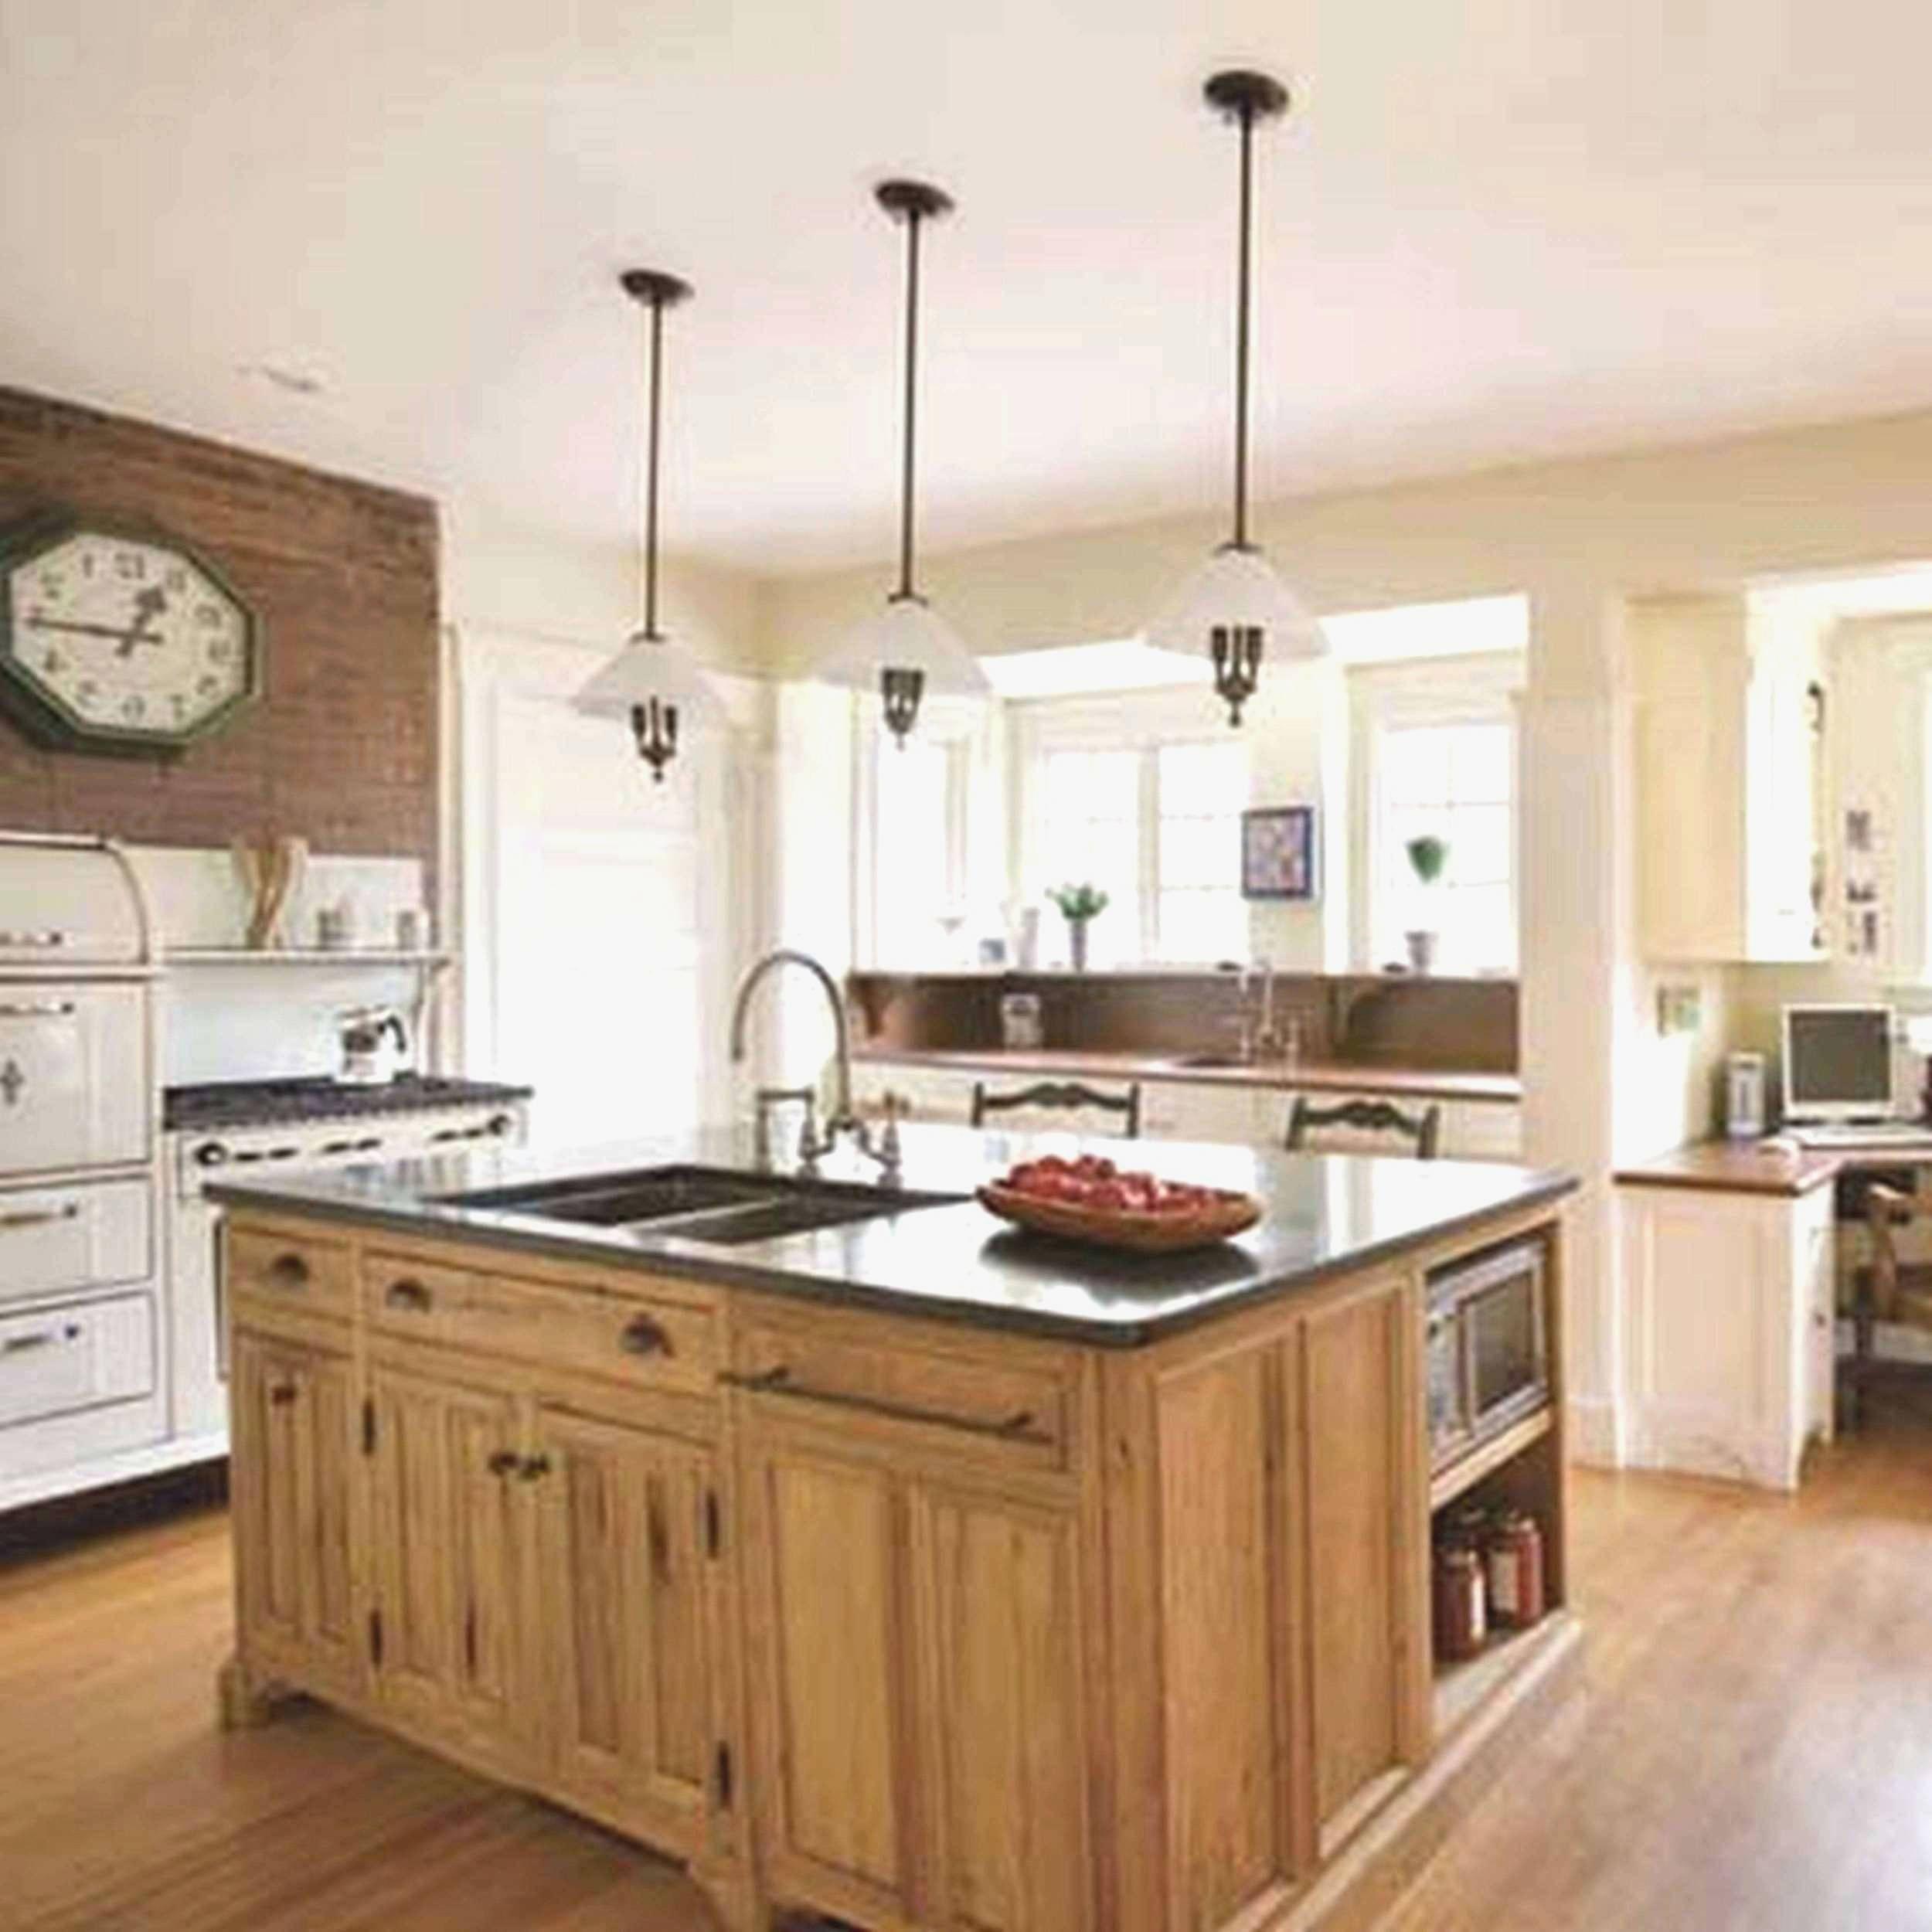 wooden kitchen floor news 18 best best hardwood for kitchen floor of wooden kitchen floor